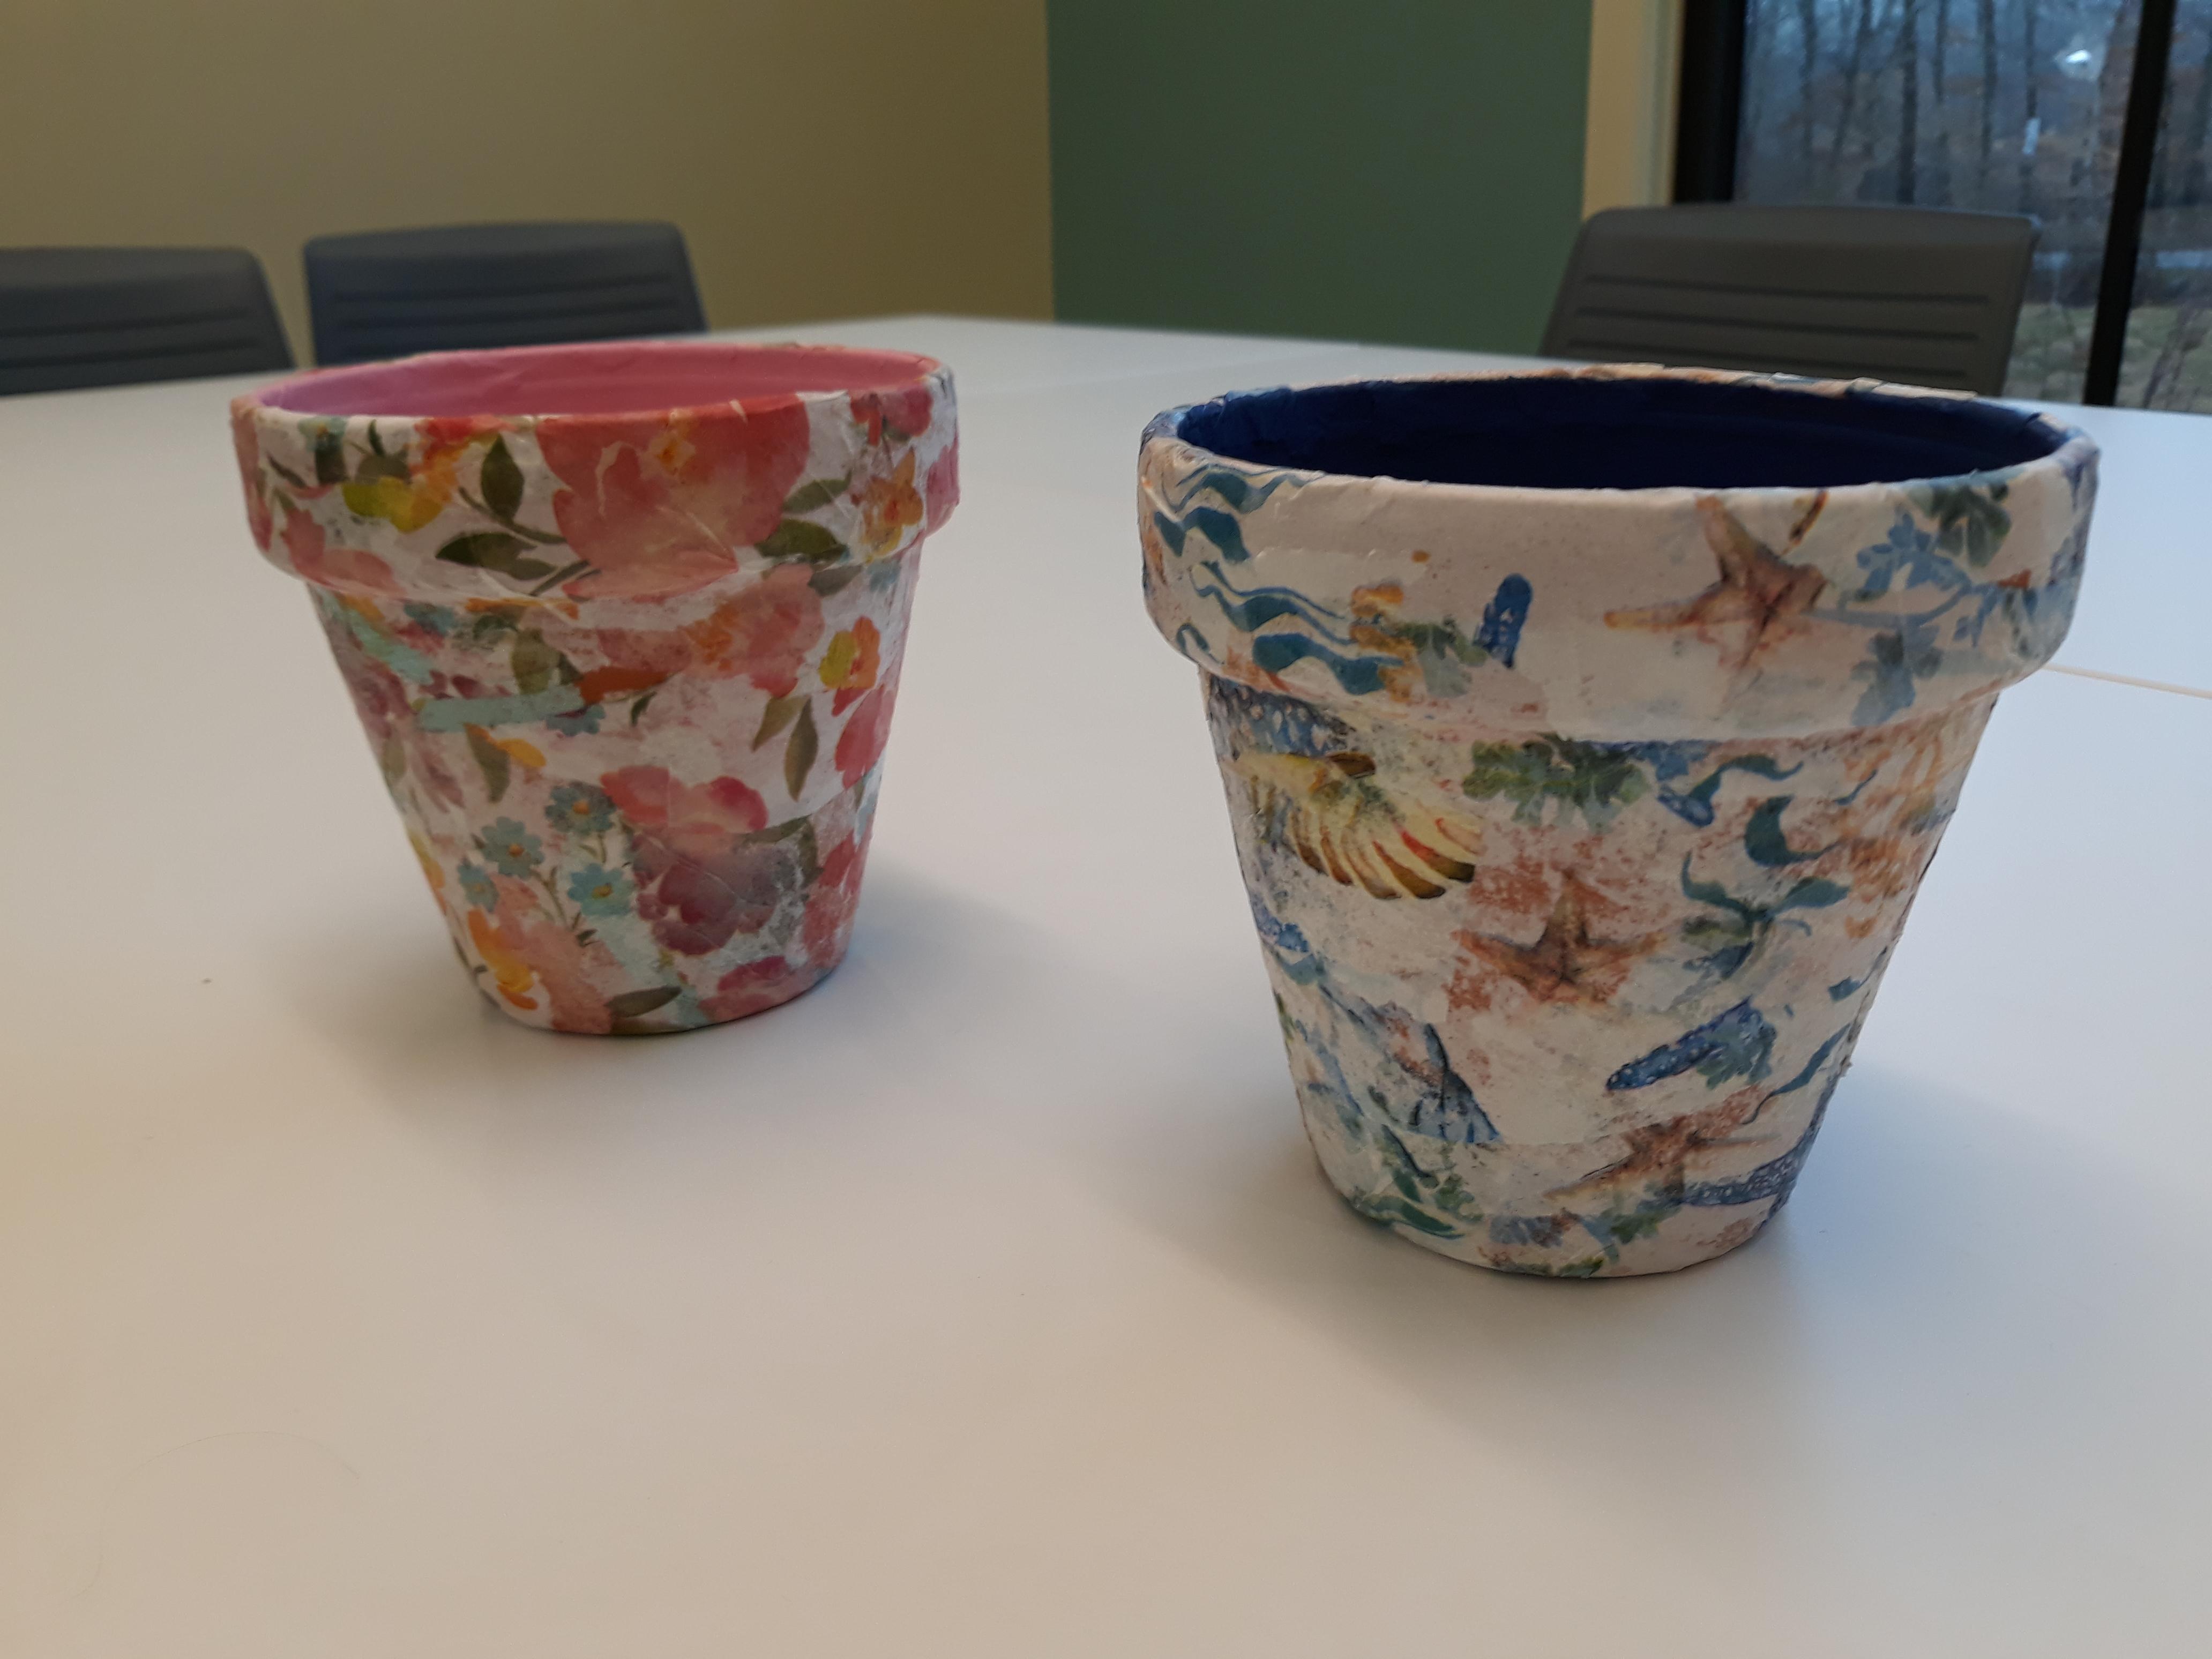 POSTPONED - CreaTiv Craft: Decorated Flower Pots